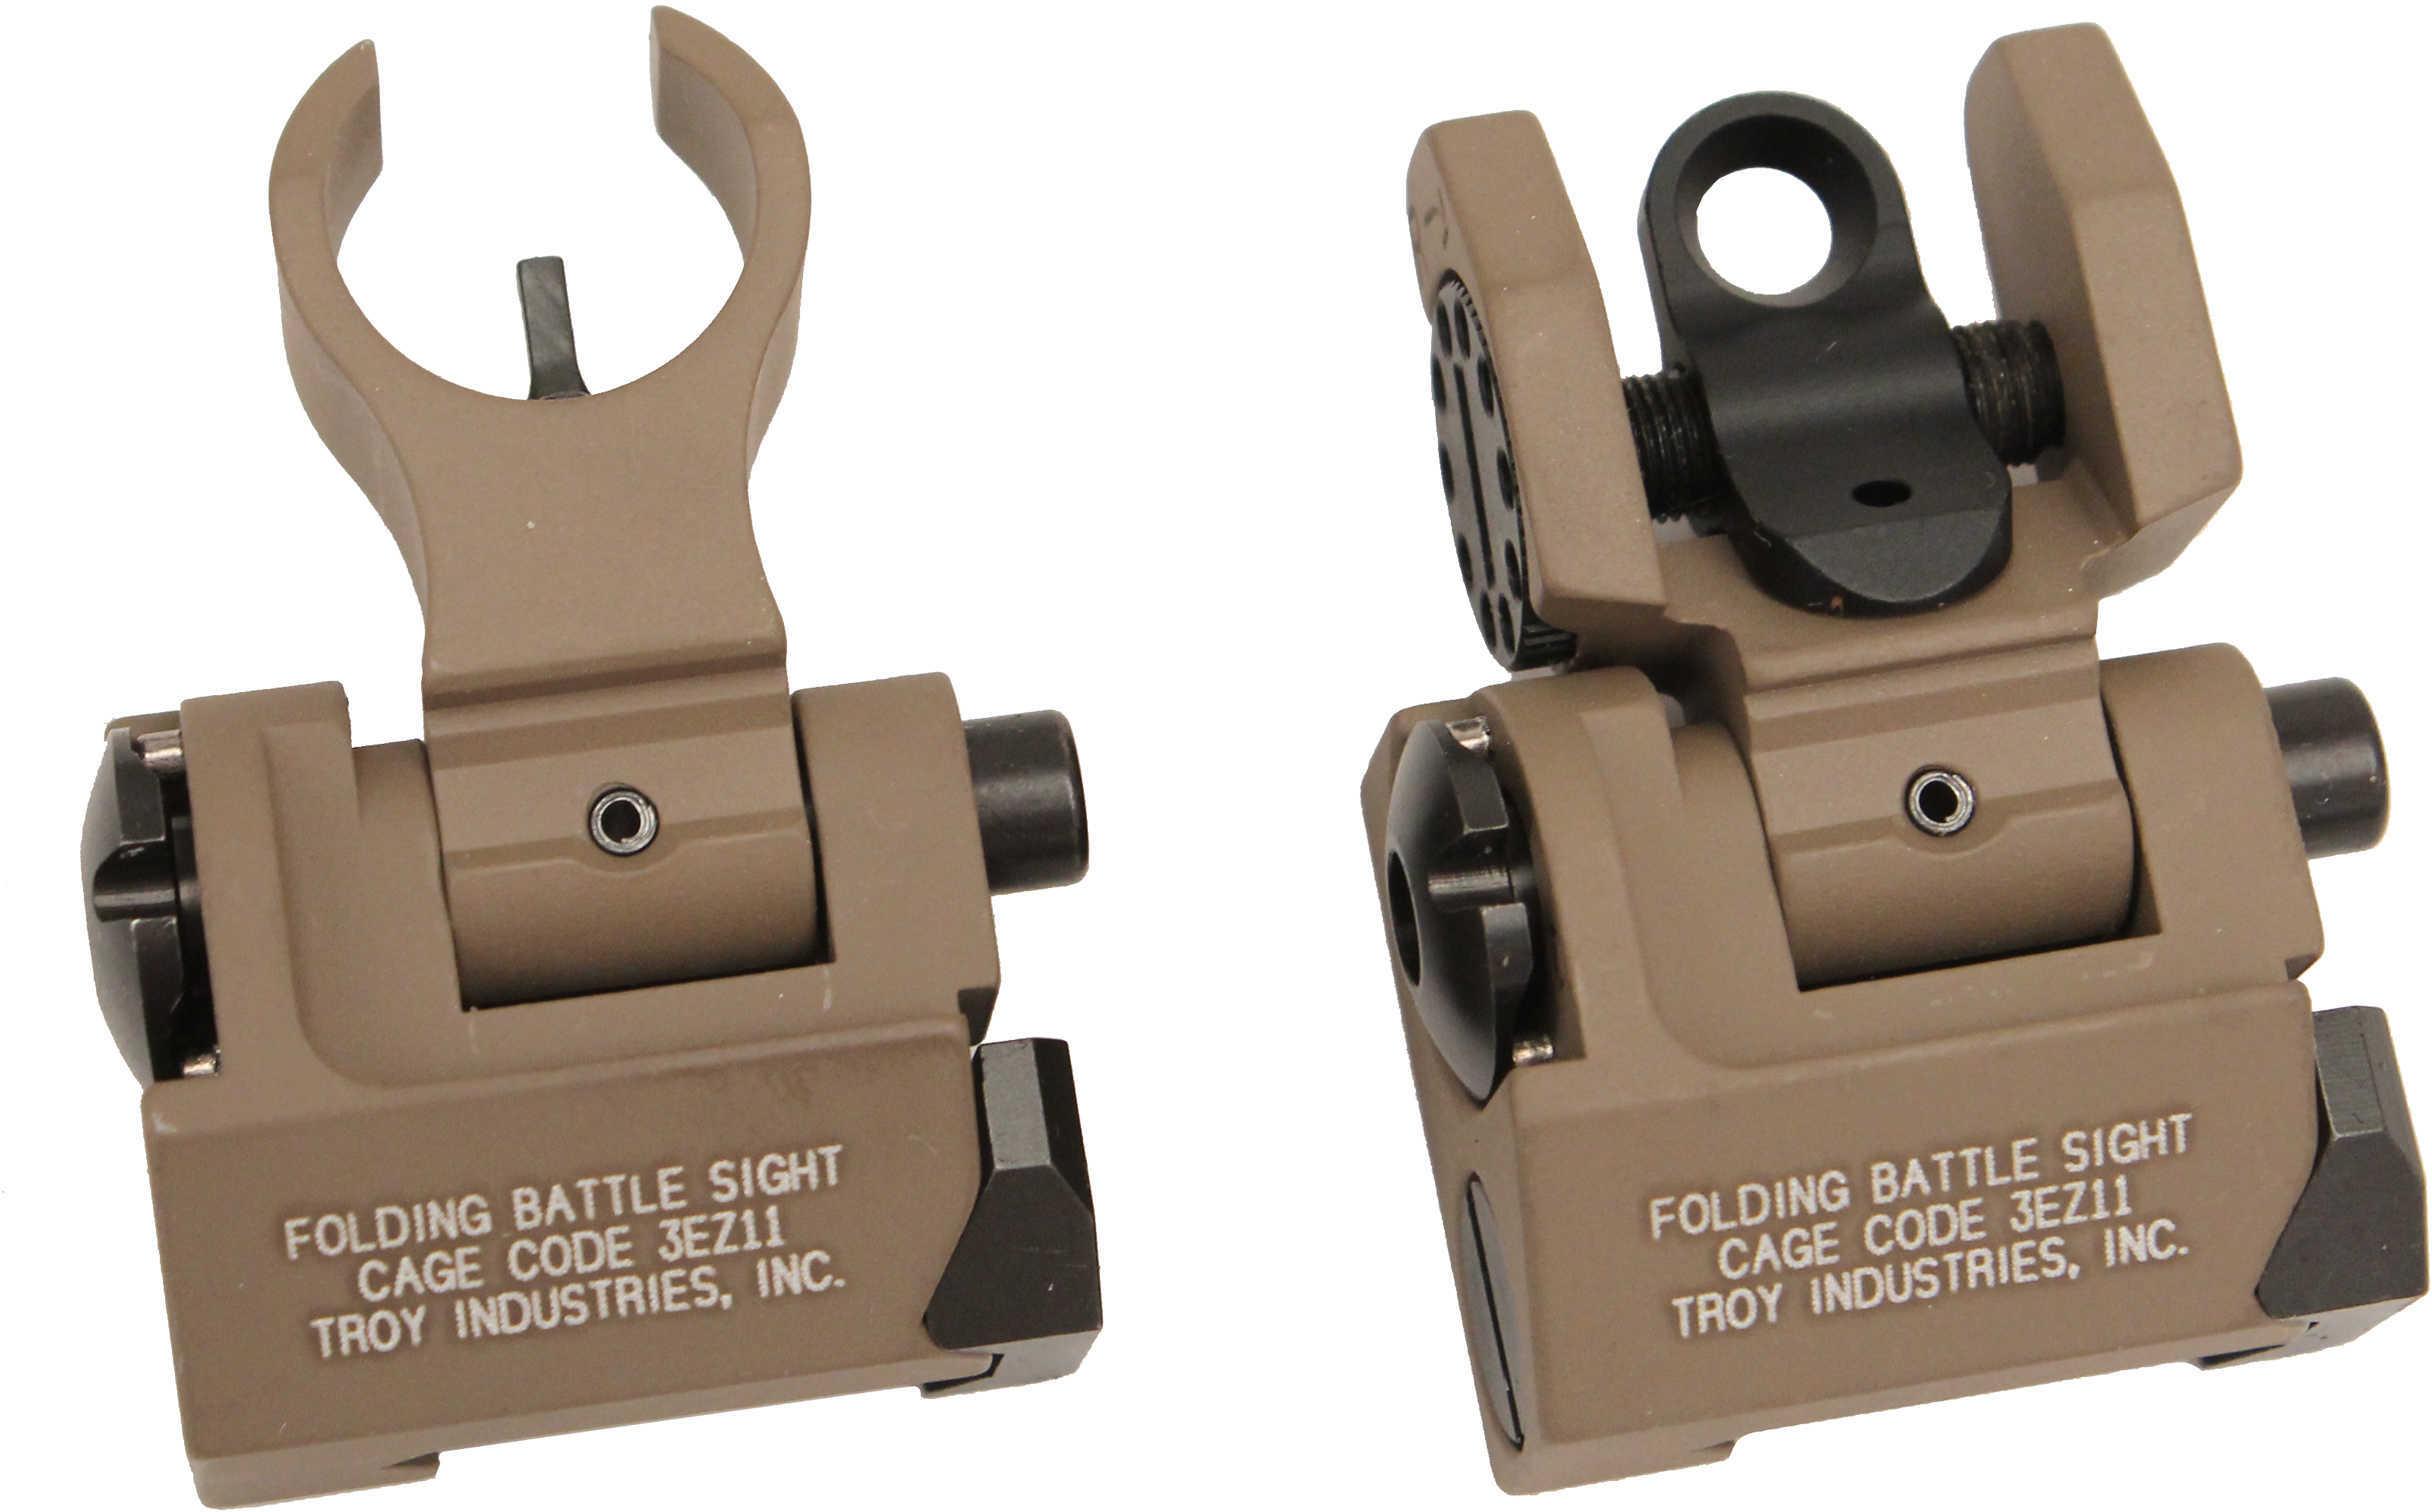 Troy Ind SSIGIARSMFT BattleSight Micro Set HK Front/Round Rear Weapons w/Raised Top Rail Picatinny Mount Aluminum FDE